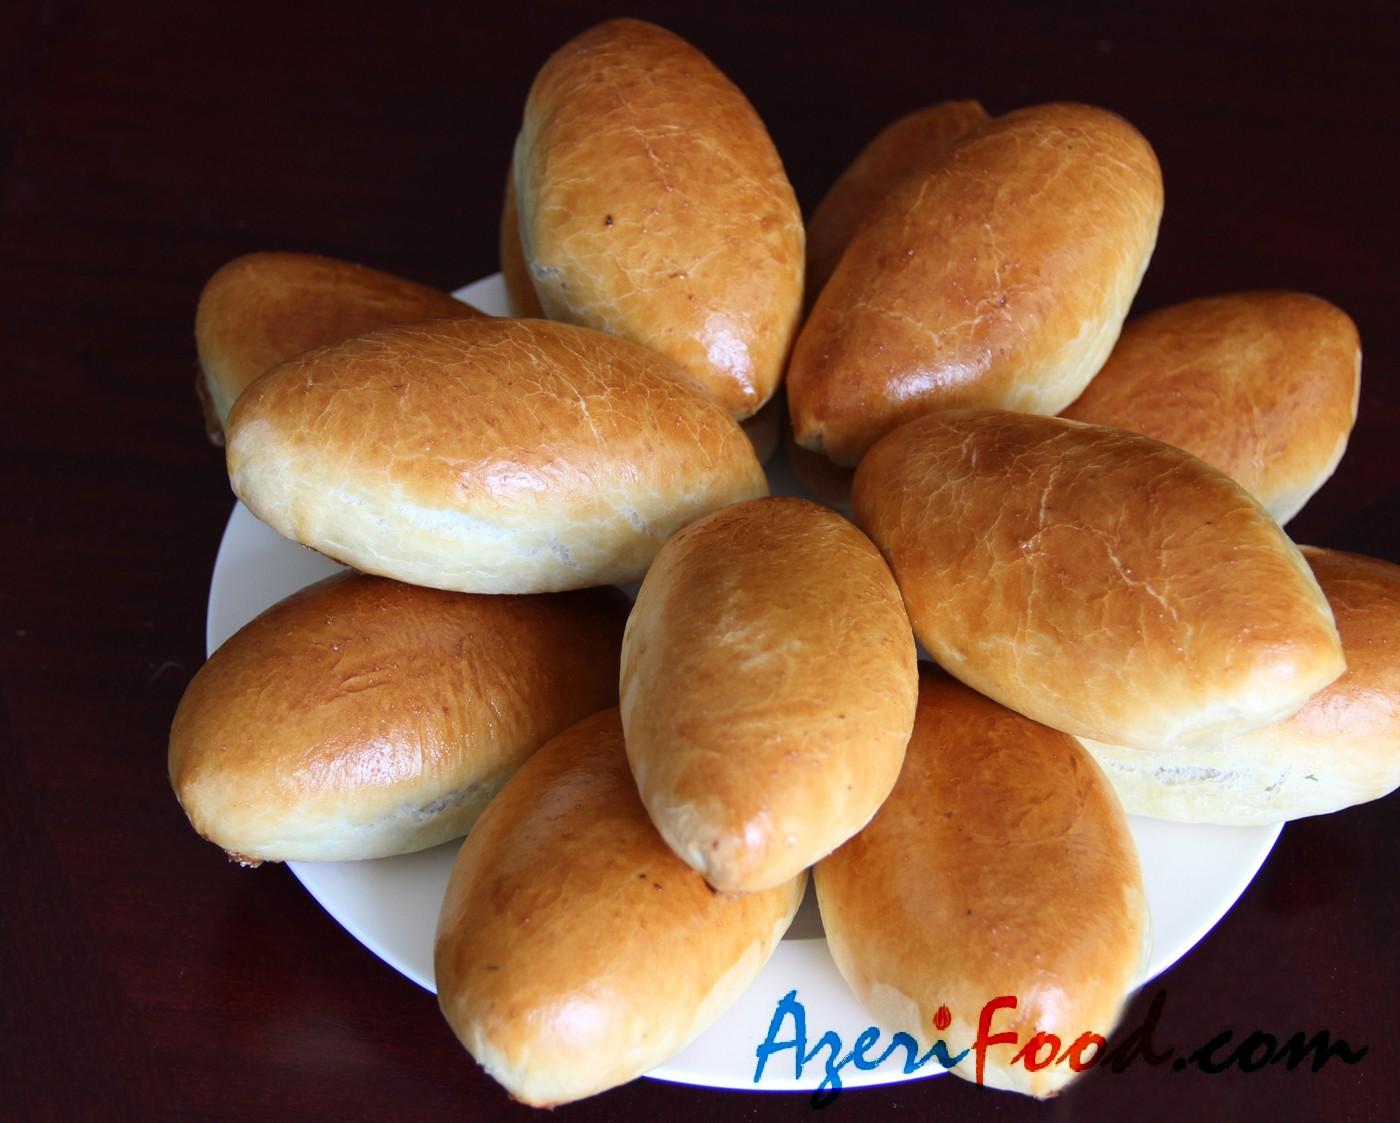 http://www.azerifood.com/images/1/pirojki%20new%201.jpg